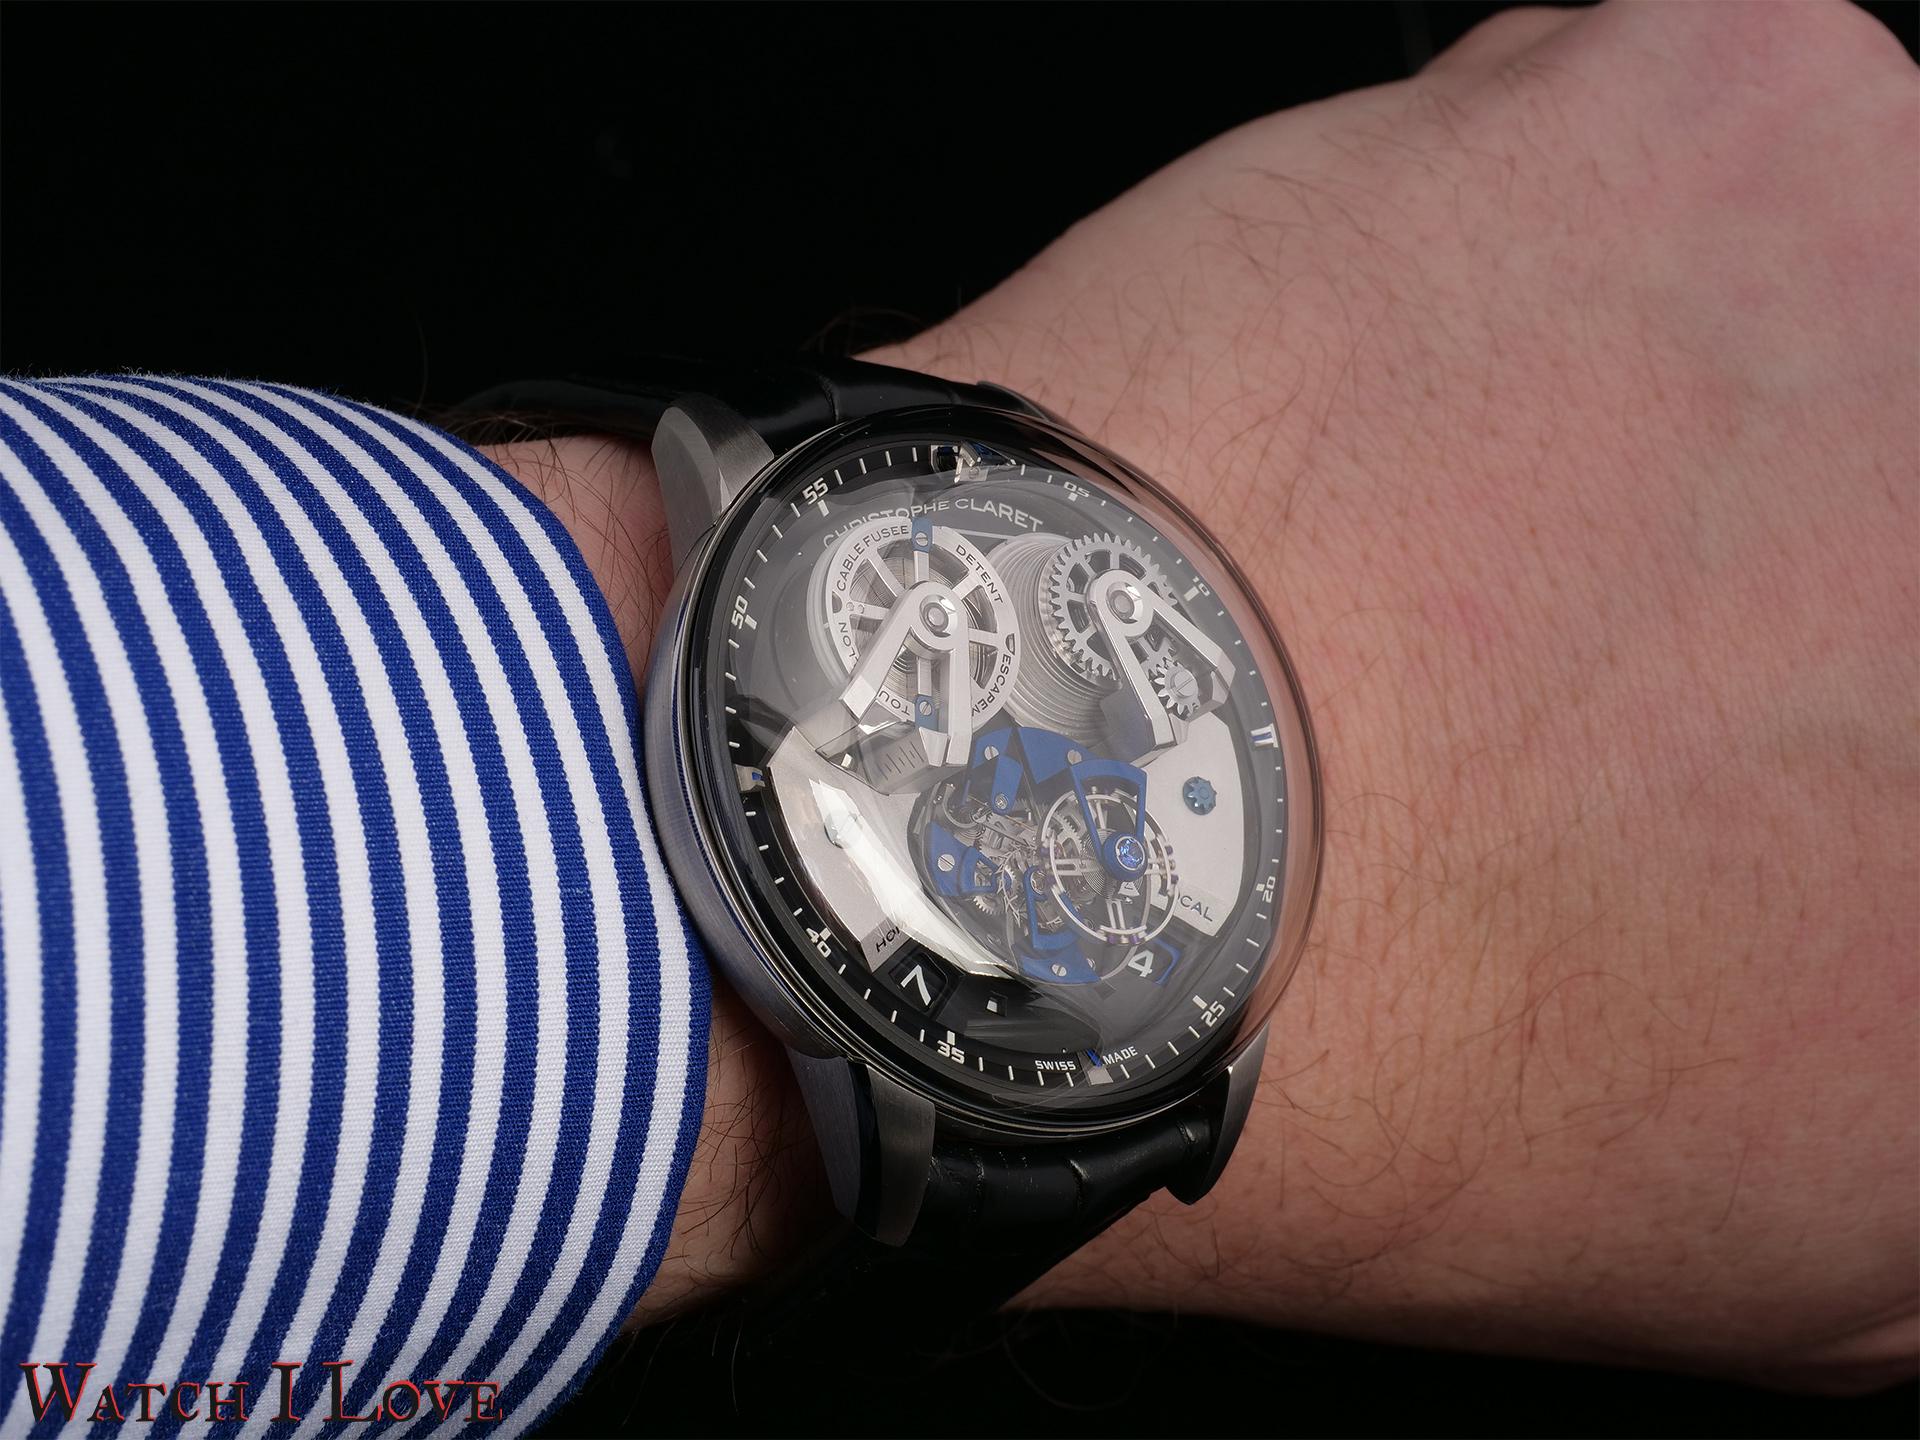 The watch felt smaller on my wrist.